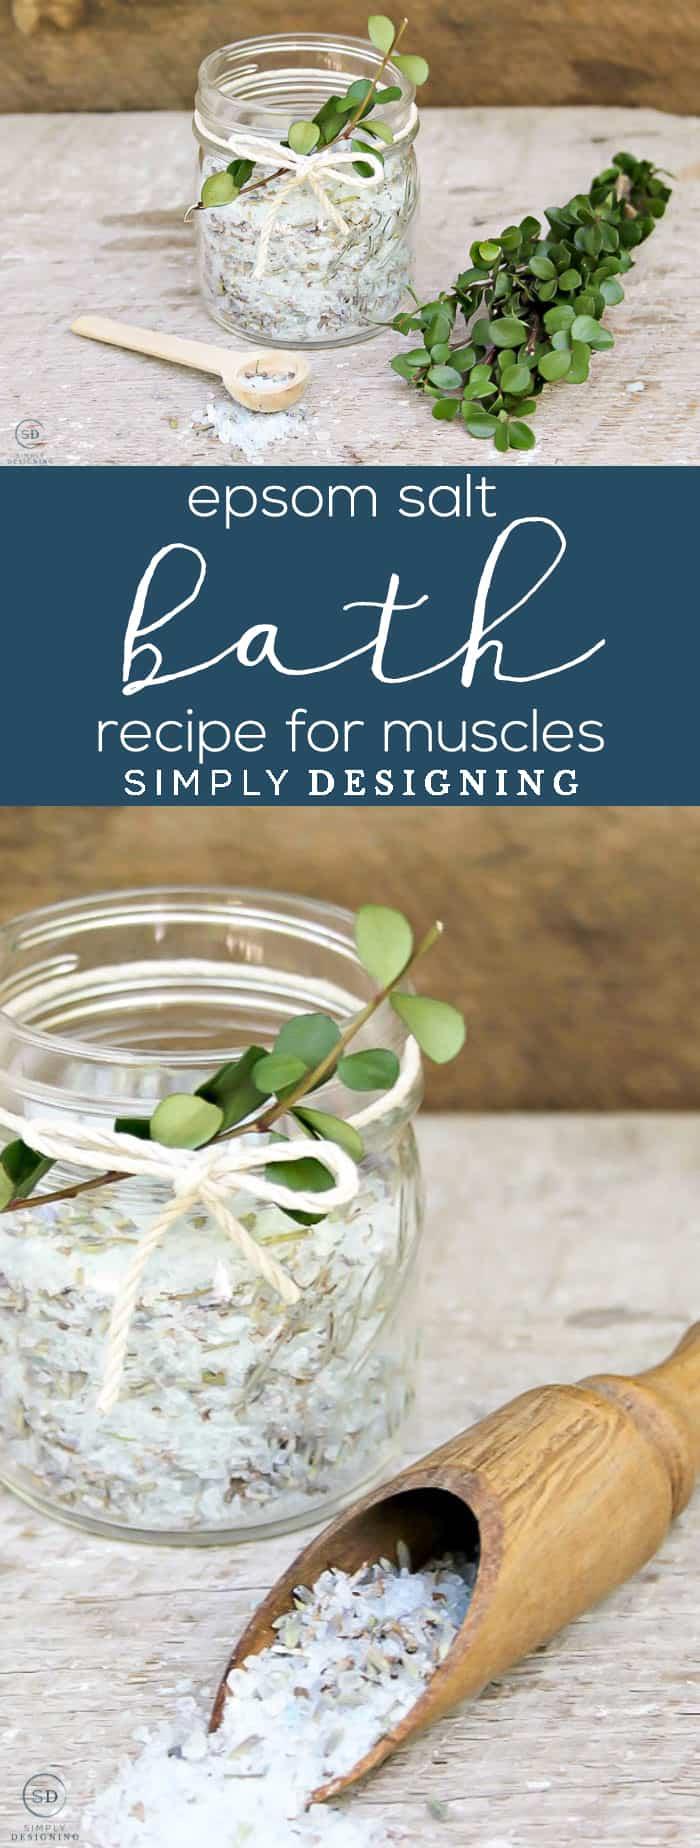 Epsom Salt Bath Recipe for Muscles _ Simply Designing